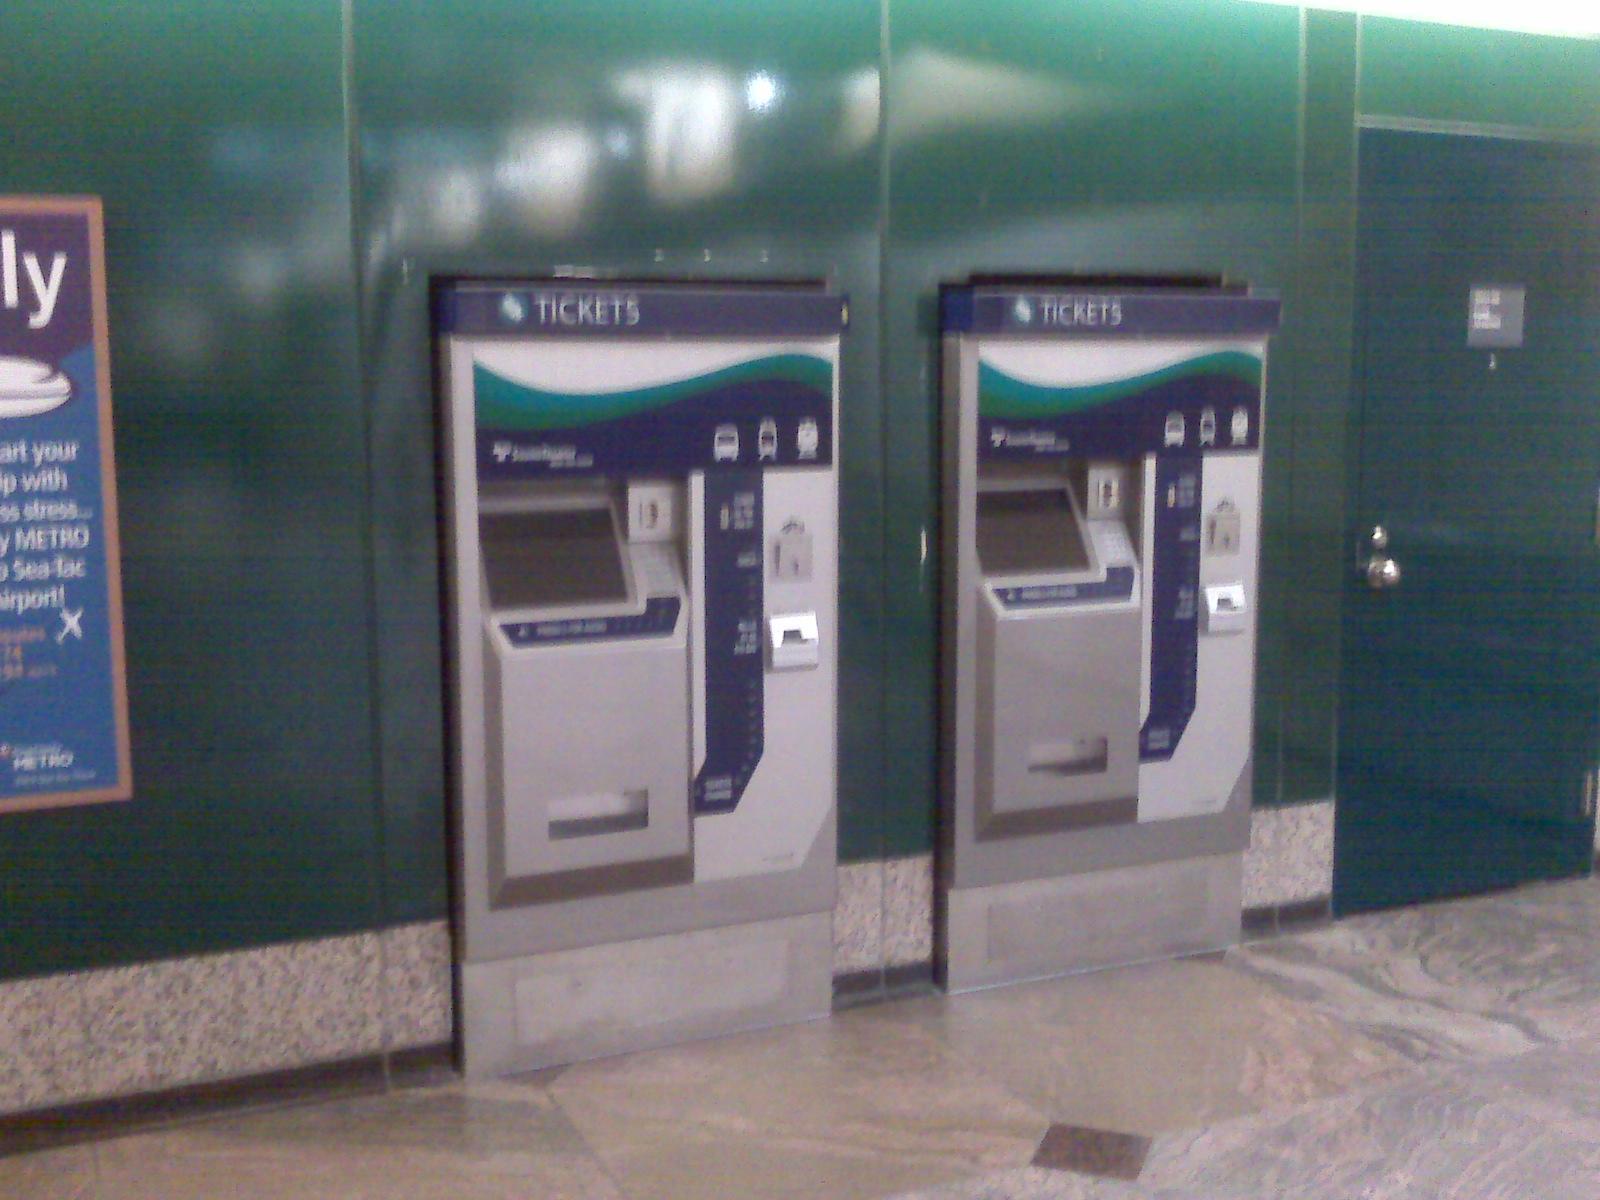 Ticket Vending Machine in Westlake Station